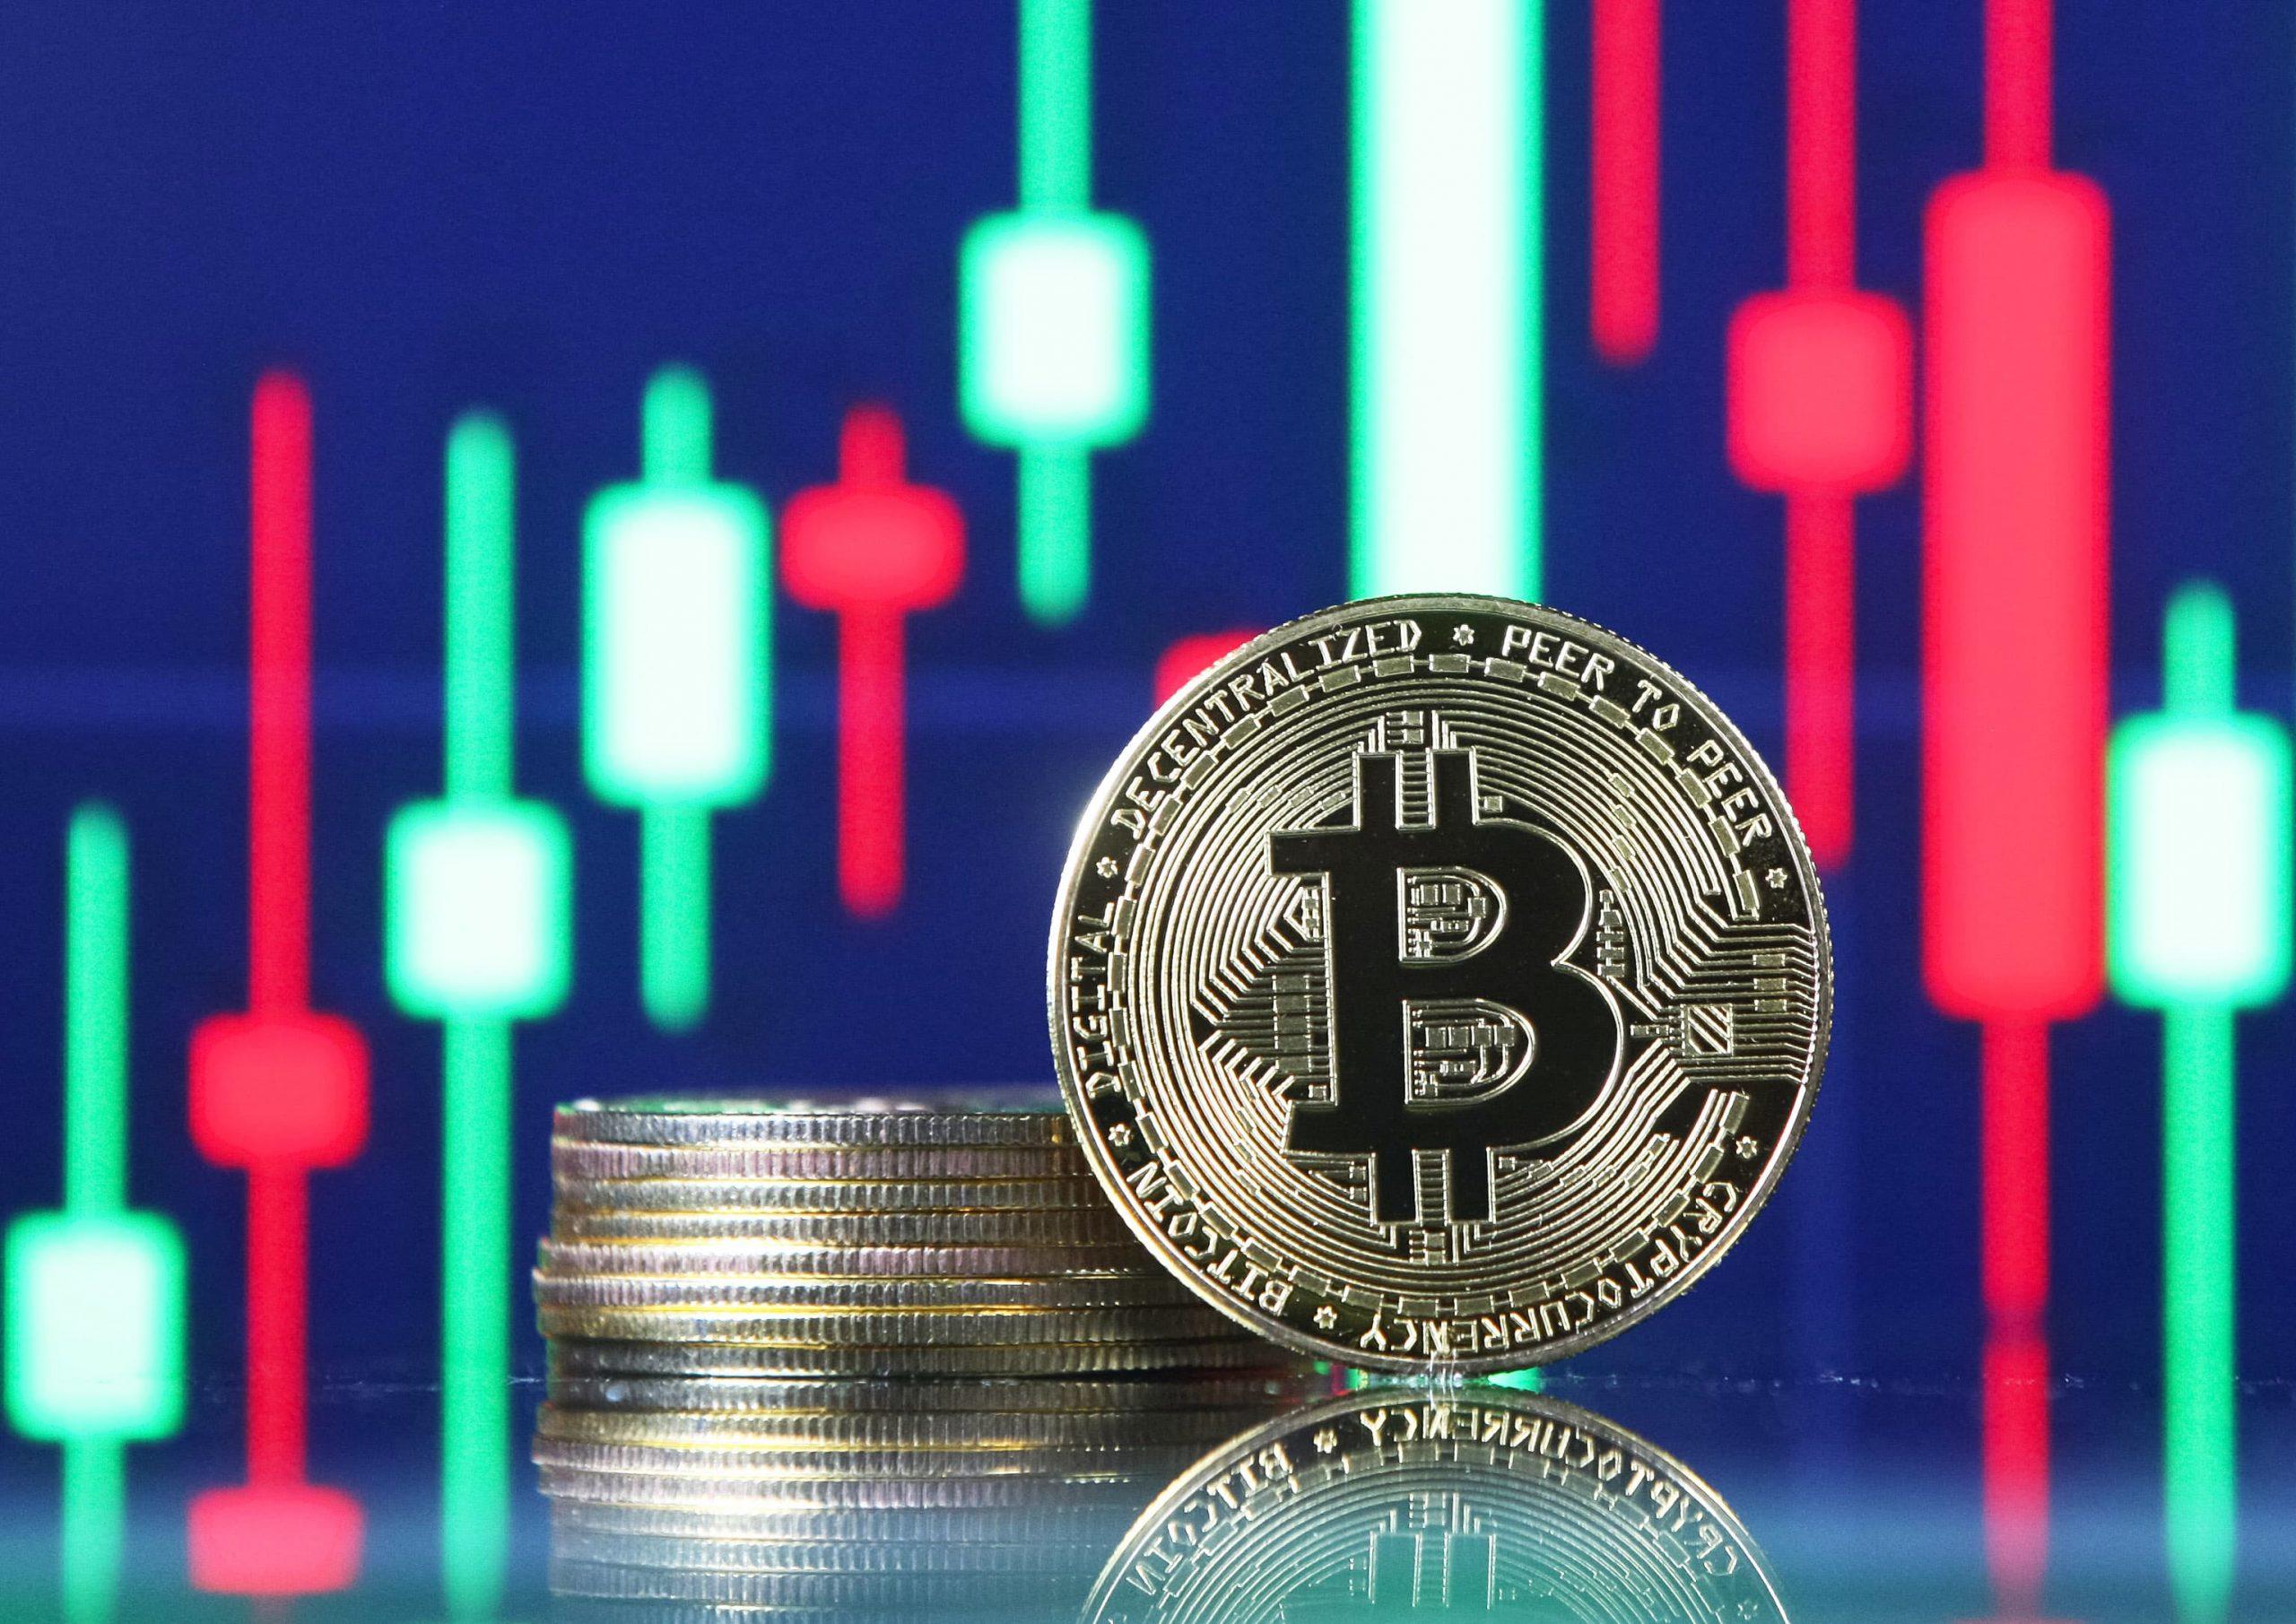 Blockchain start-ups raise record funding despite crypto slump